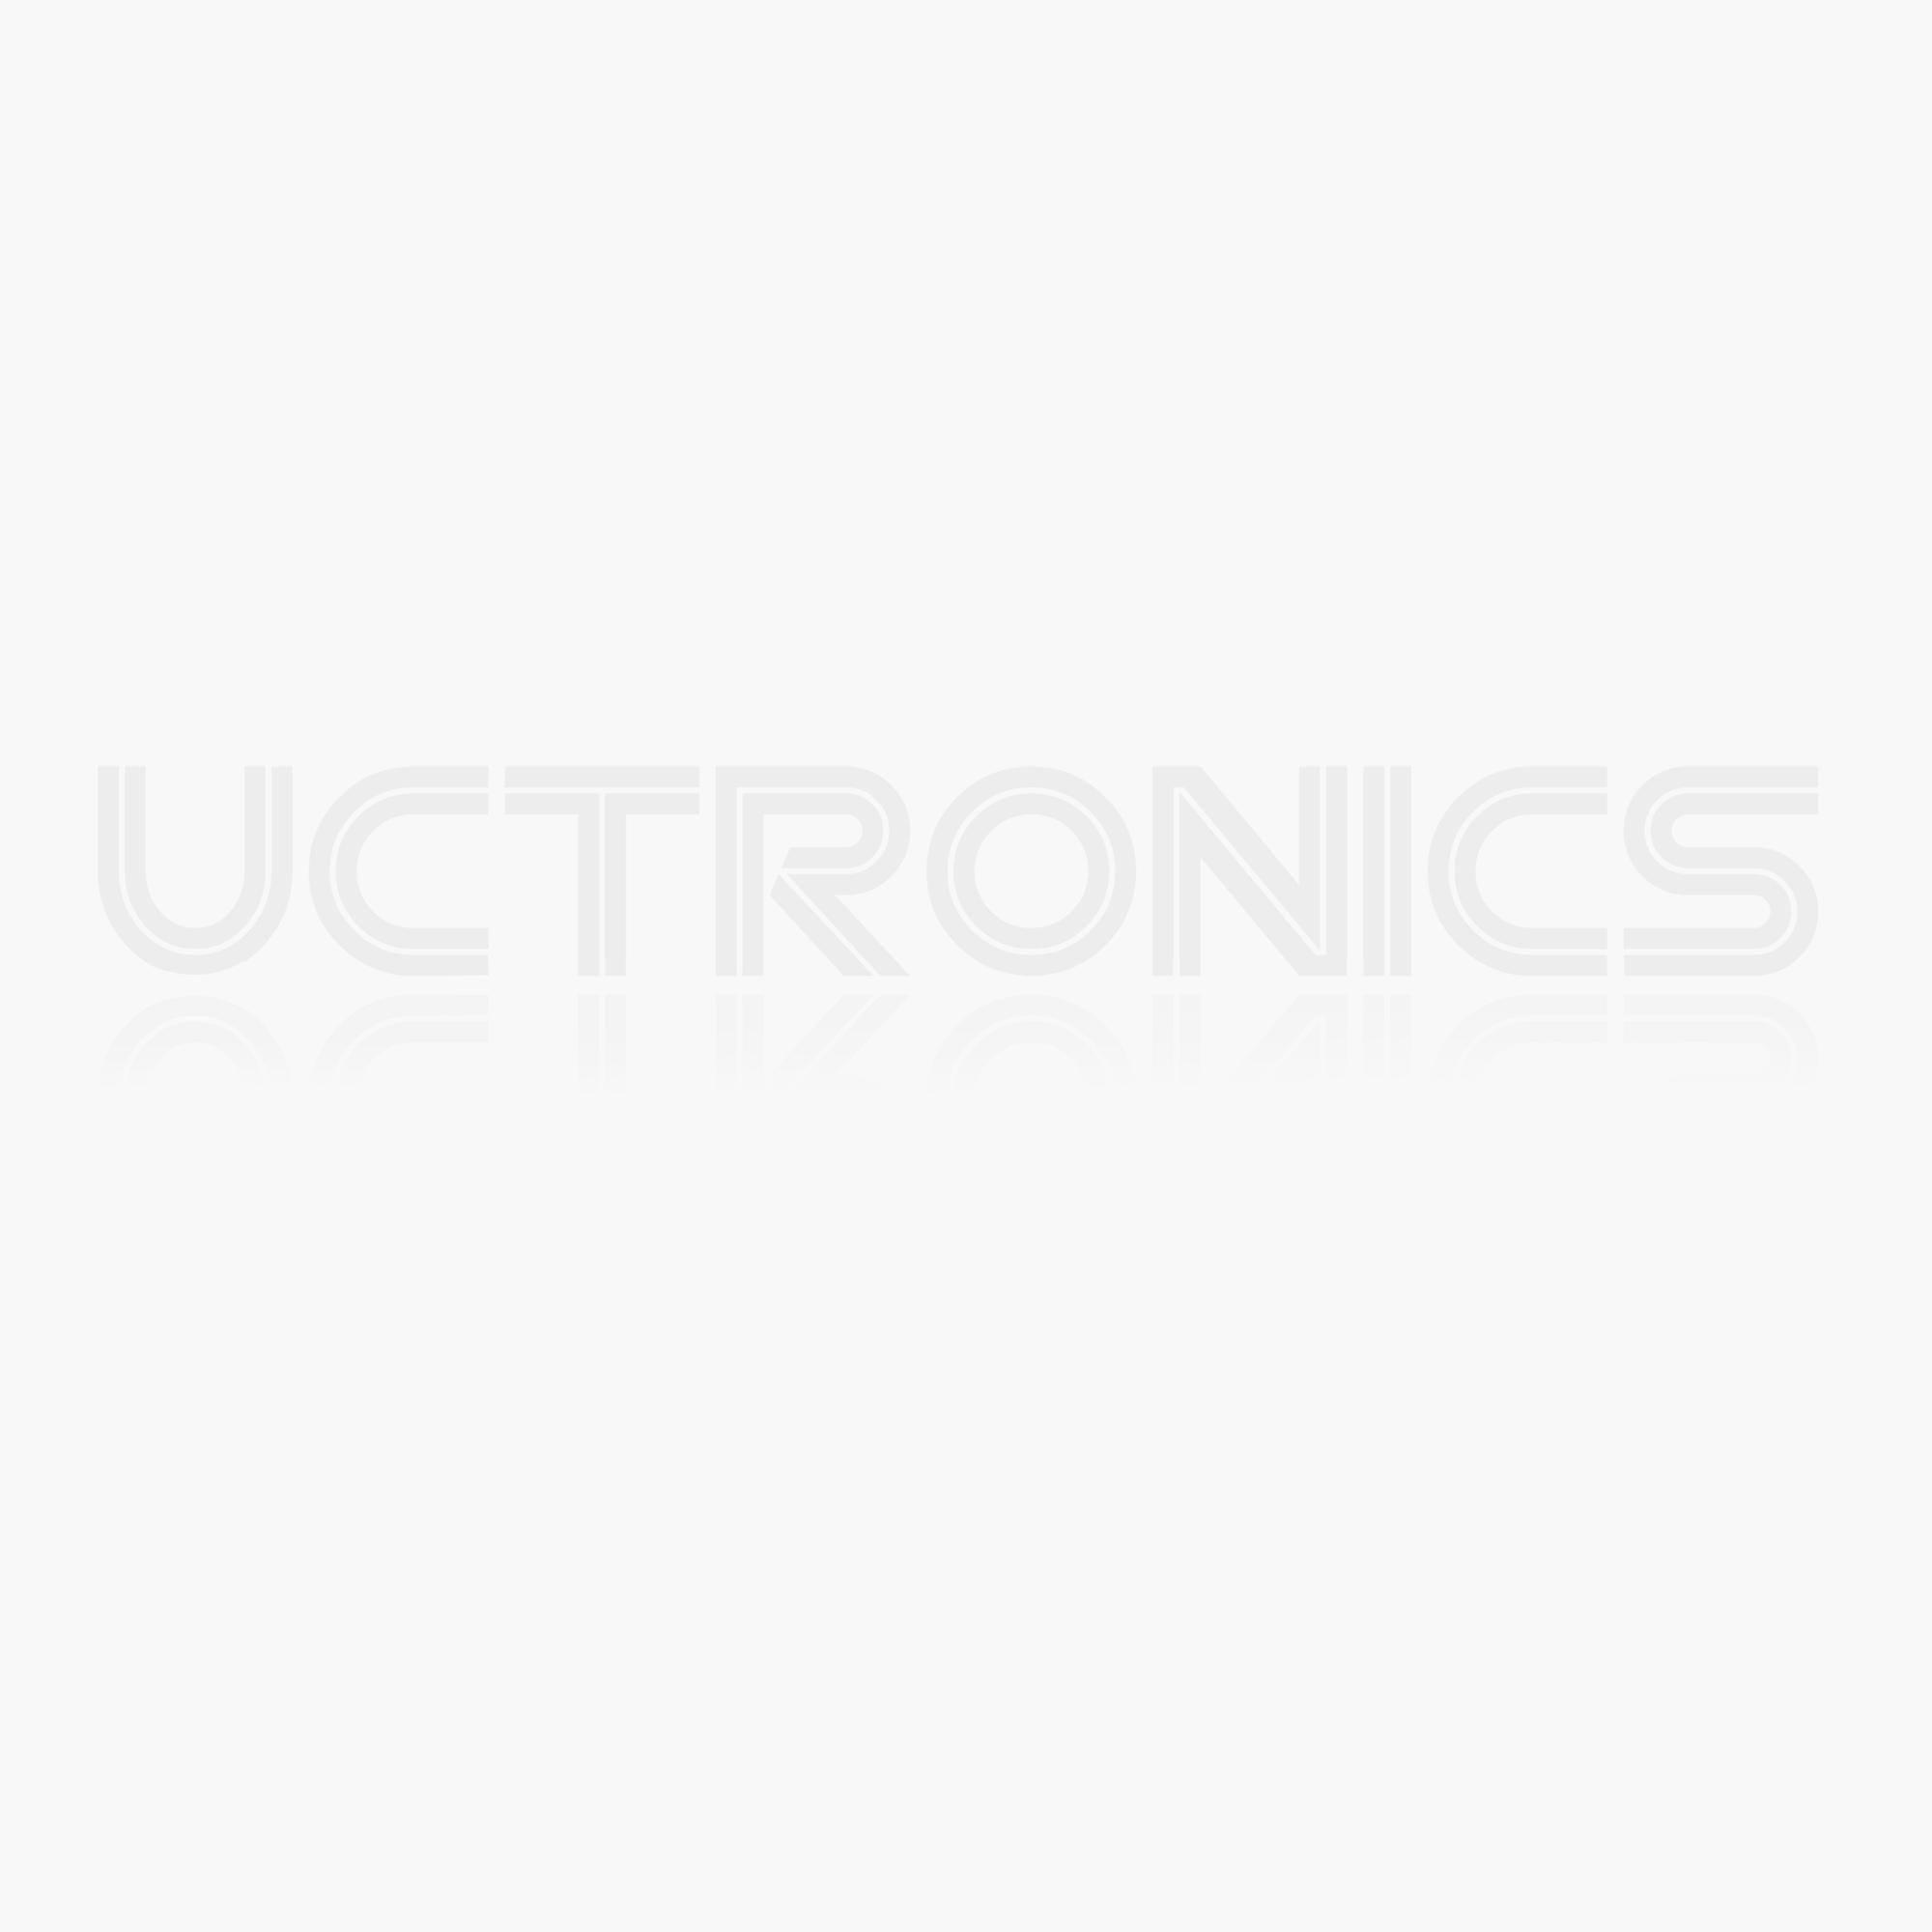 DC3V 160mA 0.28L/min Micro Vacuum Negative Pressure Air Pump for Medical Treat